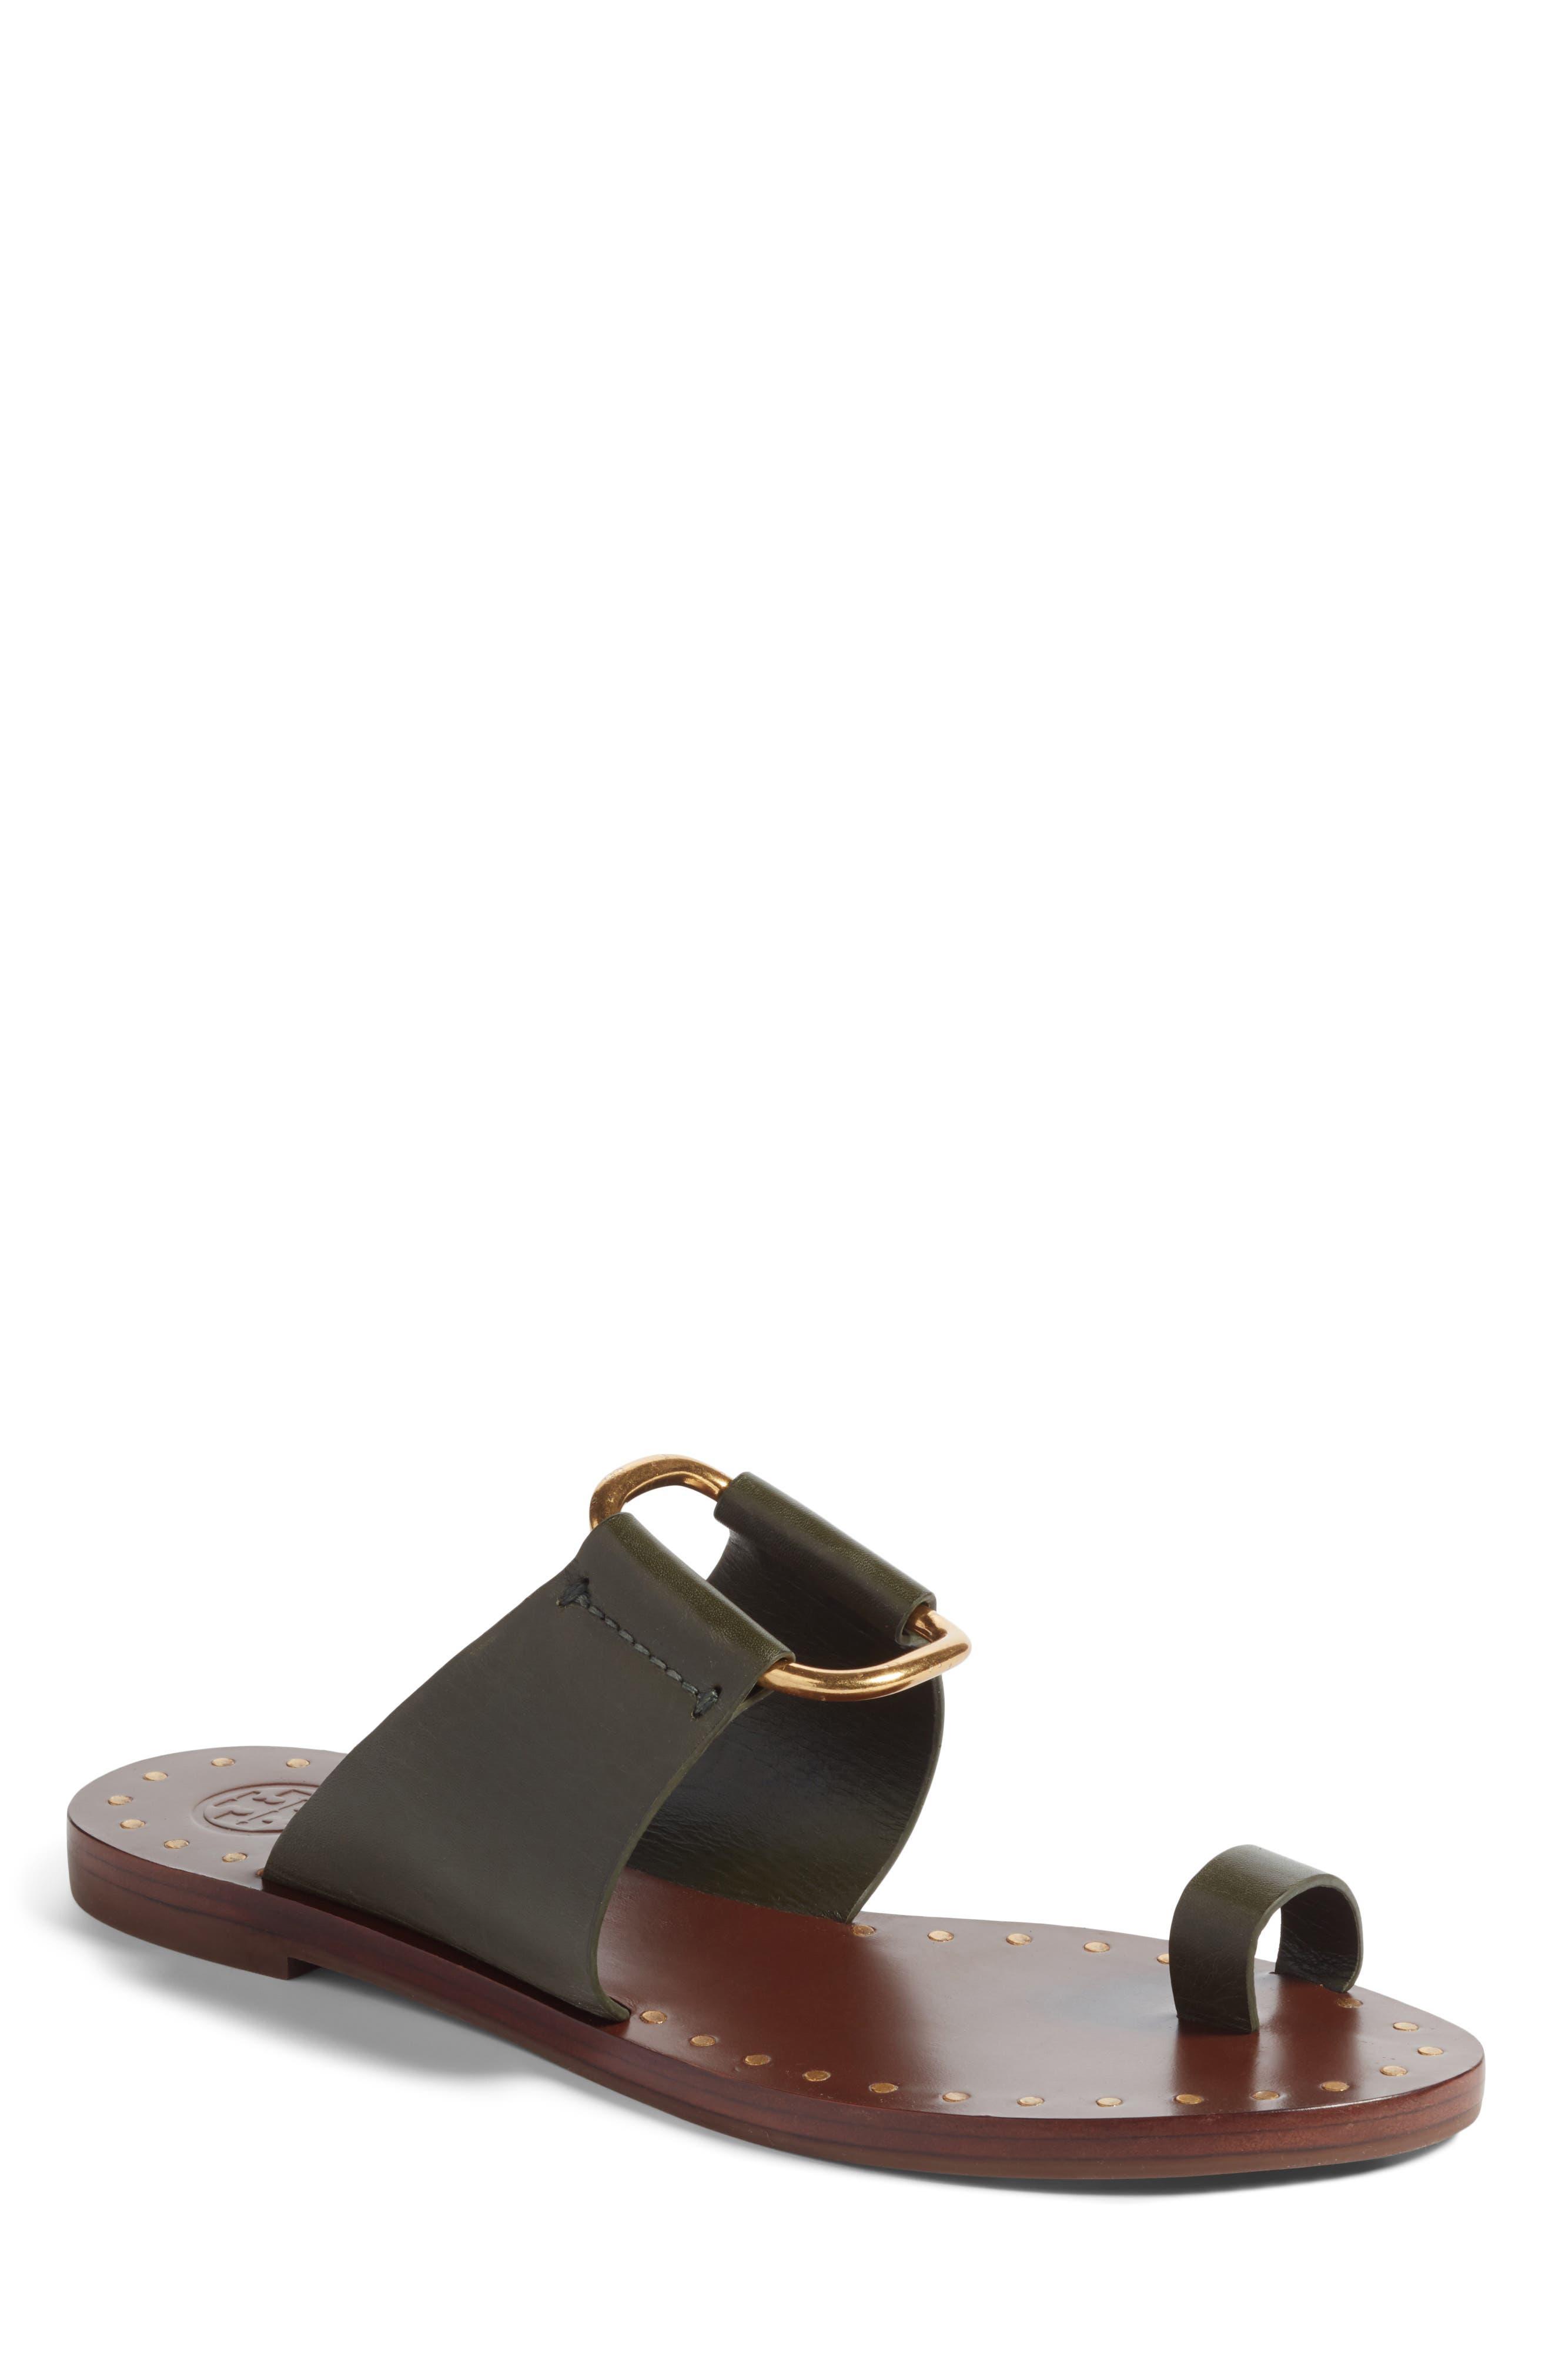 Brannan Studded Sandal,                         Main,                         color, LECCIO